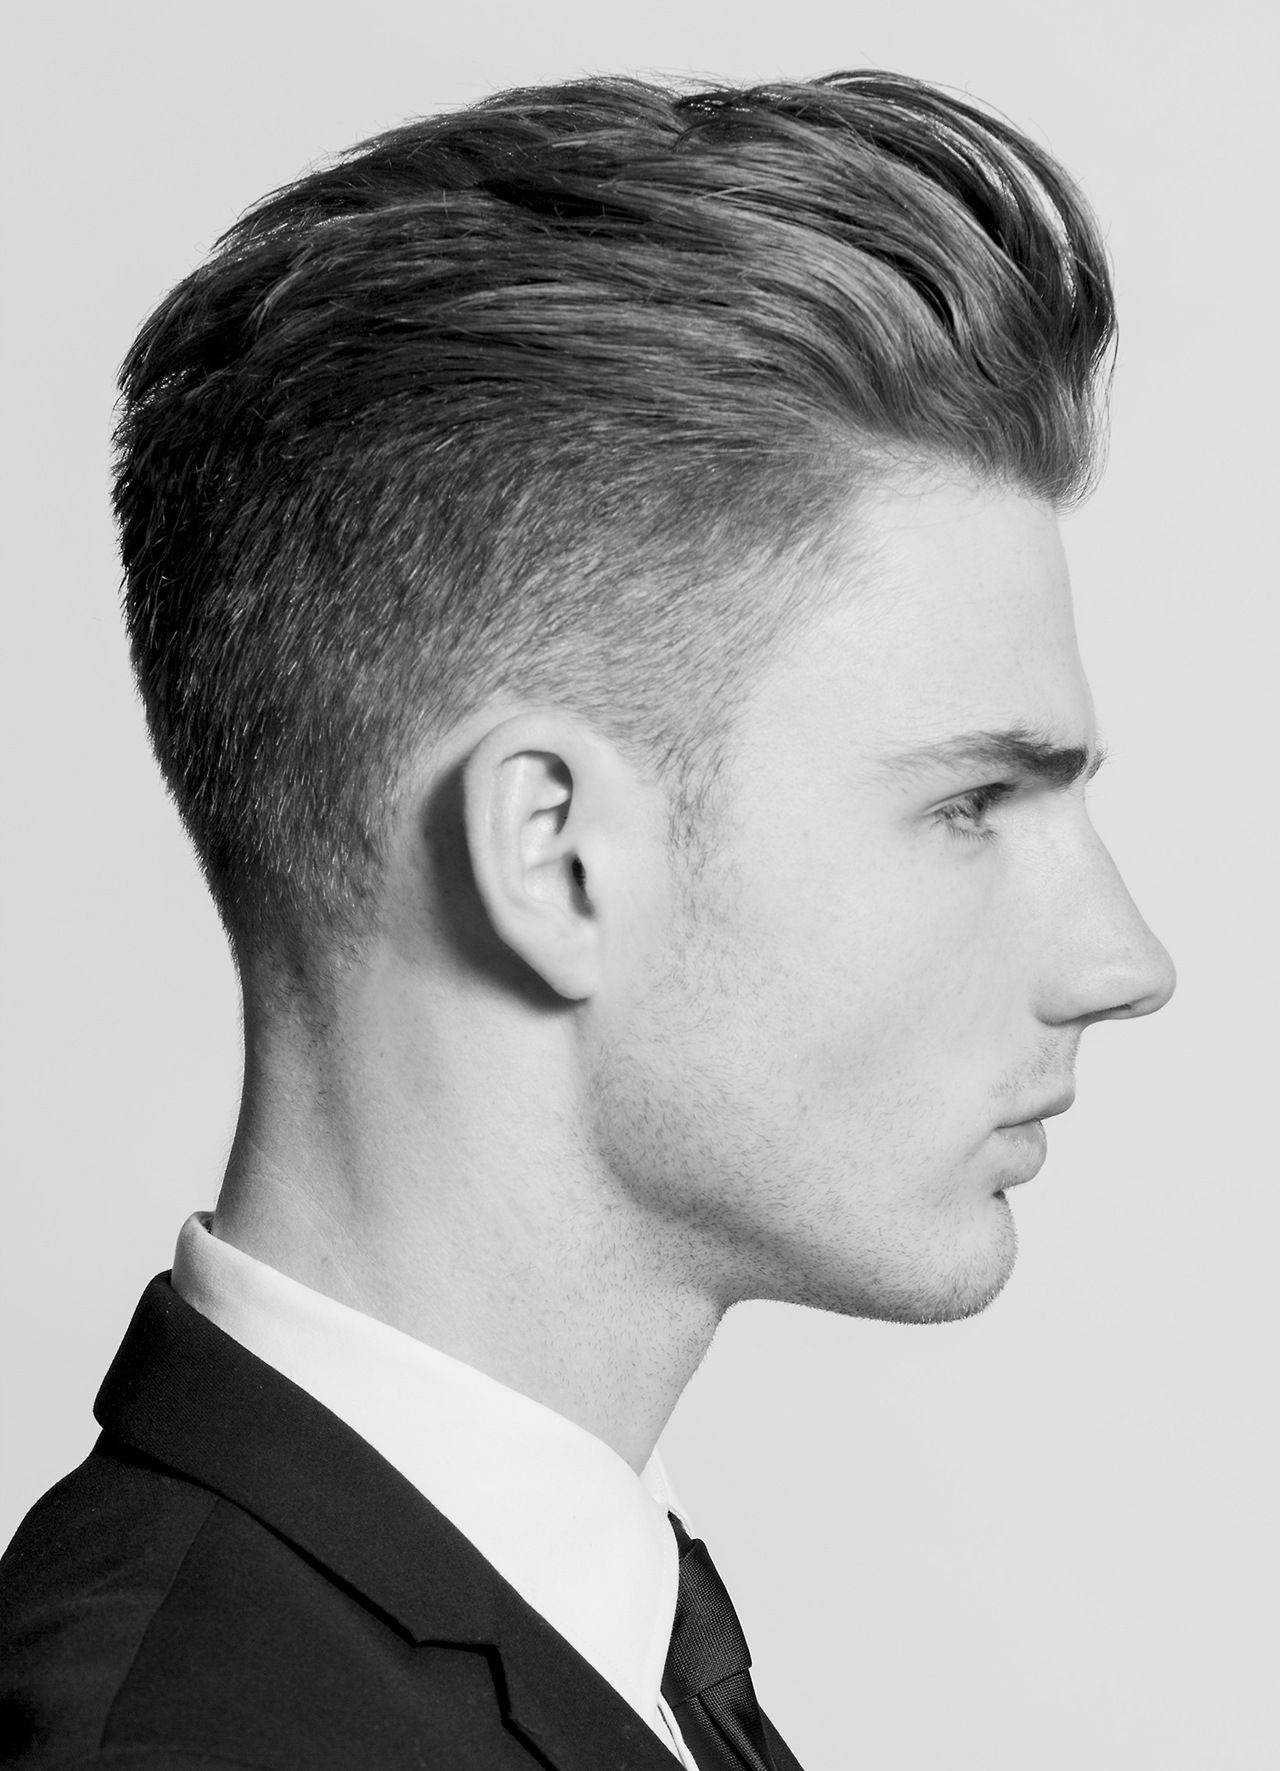 best short haircuts for men 2015 | hairstlye | pompadour